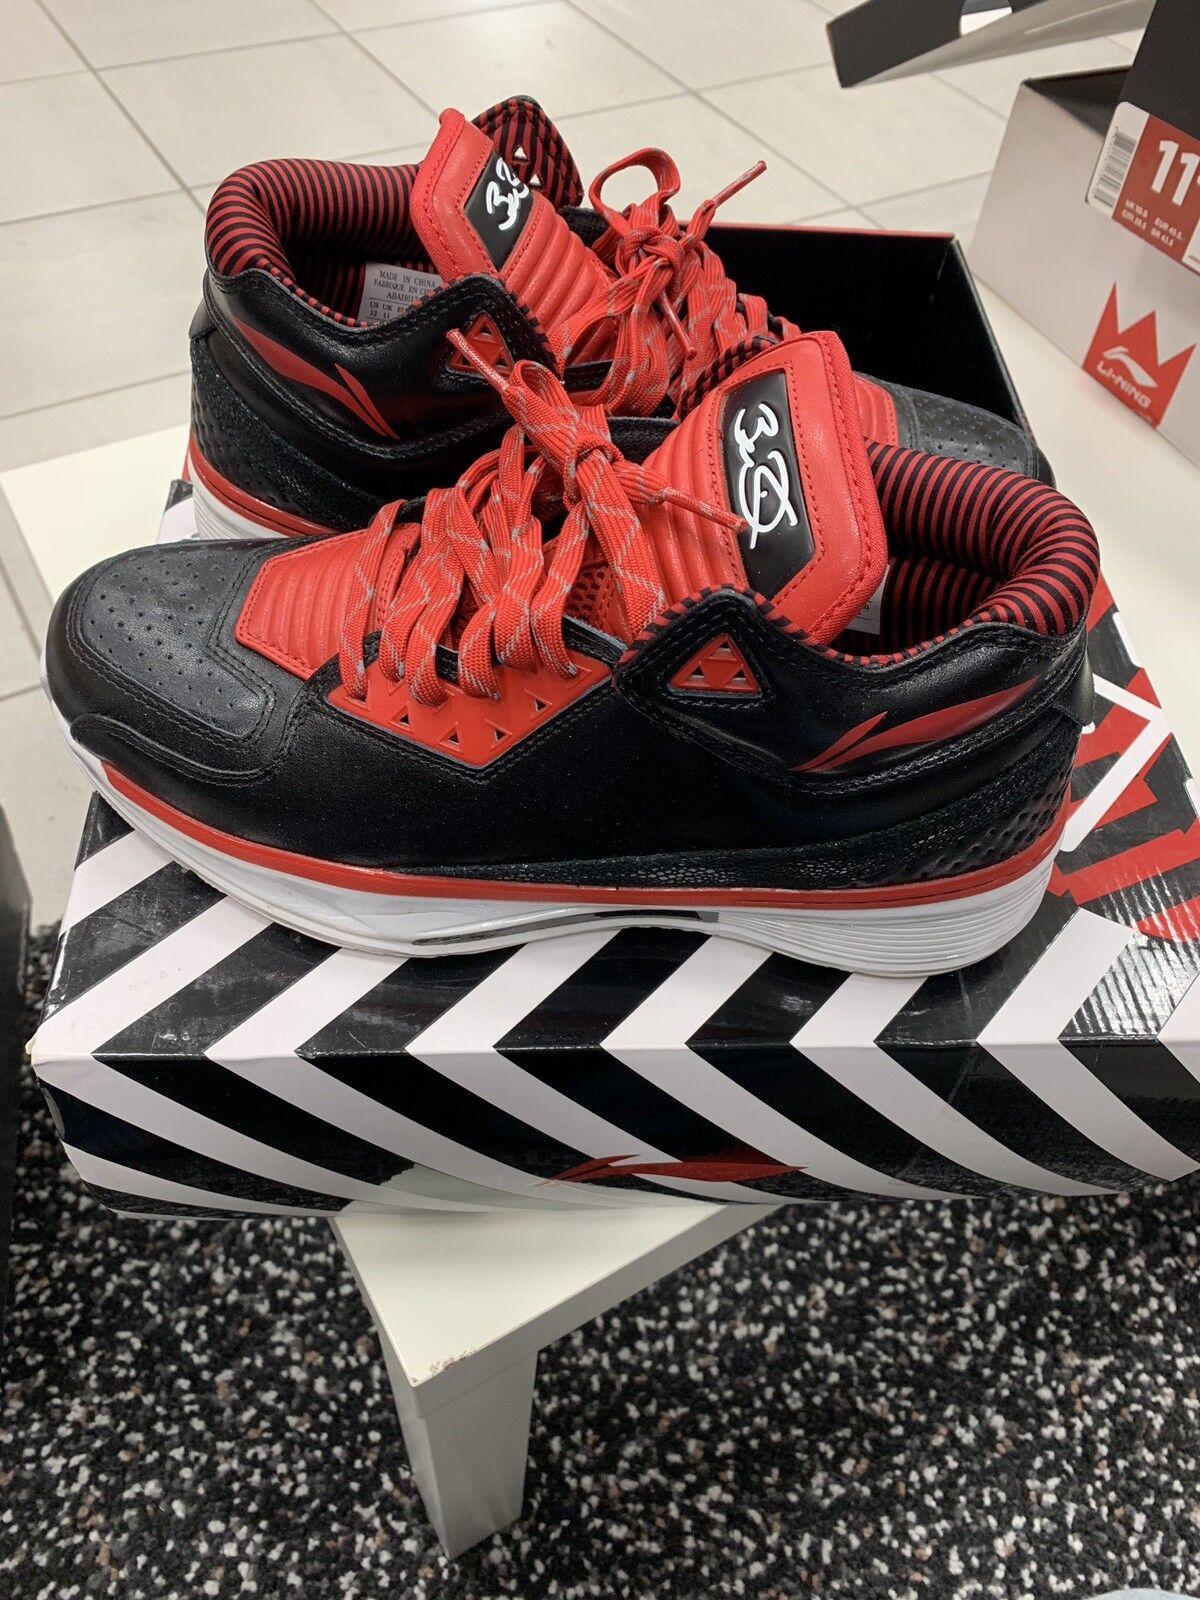 Uomo Li-Ning Way of of of Wade 2 WOW ABAH017-2 nero rosso Sz 12 scarpe e803ee